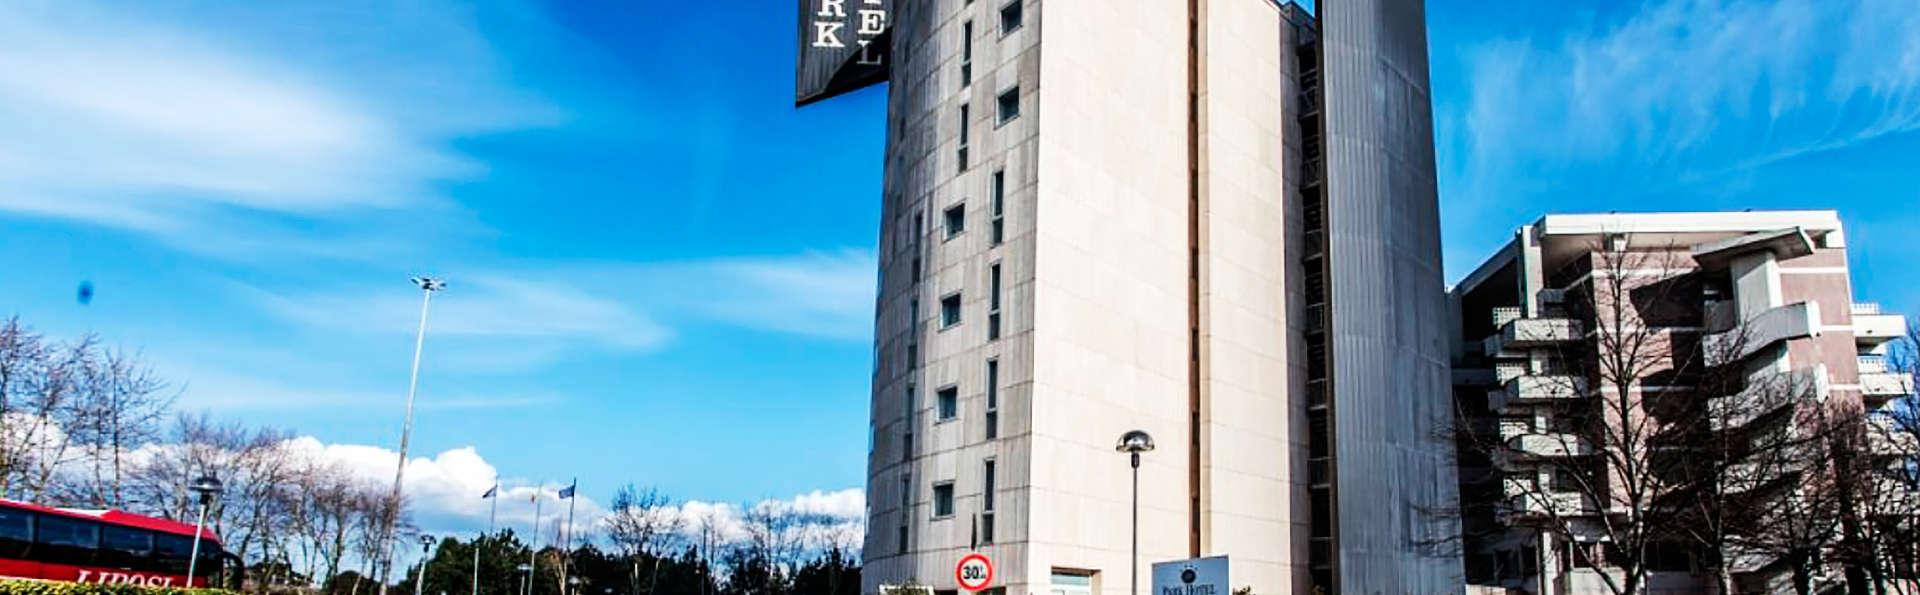 Perugia Park Hotel - edit_front.jpg